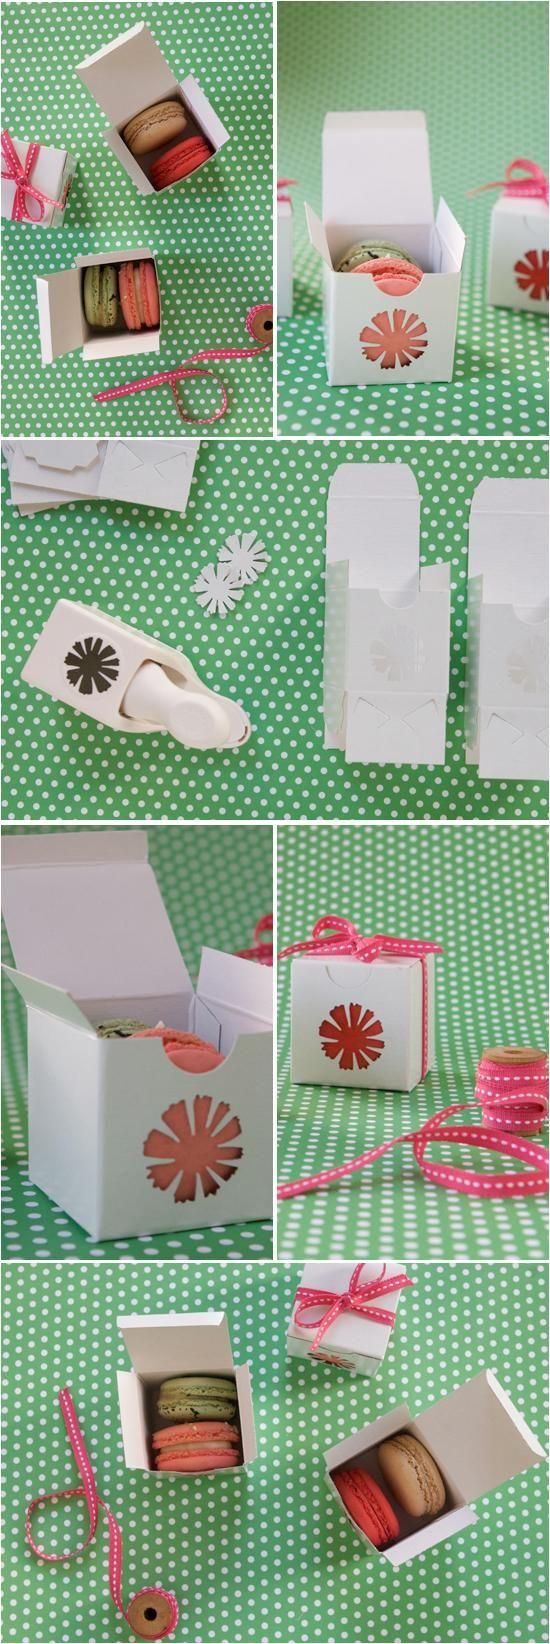 DIY Tutorial: DIY WEDDING / DIY Macaron Favors - Bead&Cord